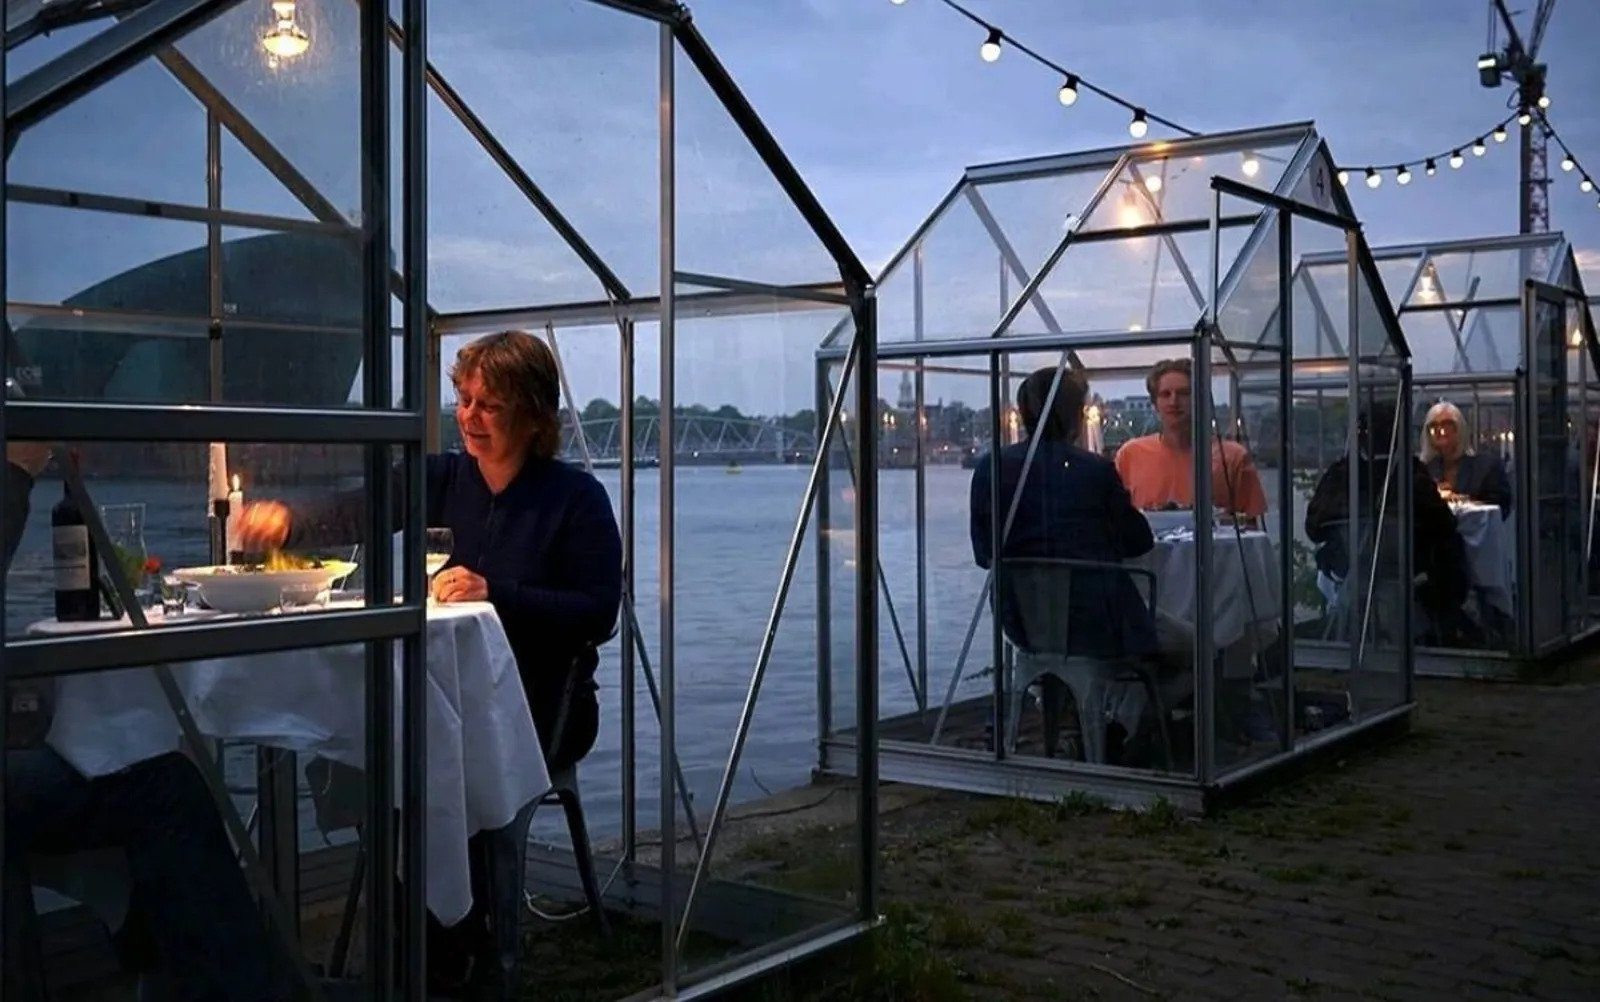 social_distancing_restaurant